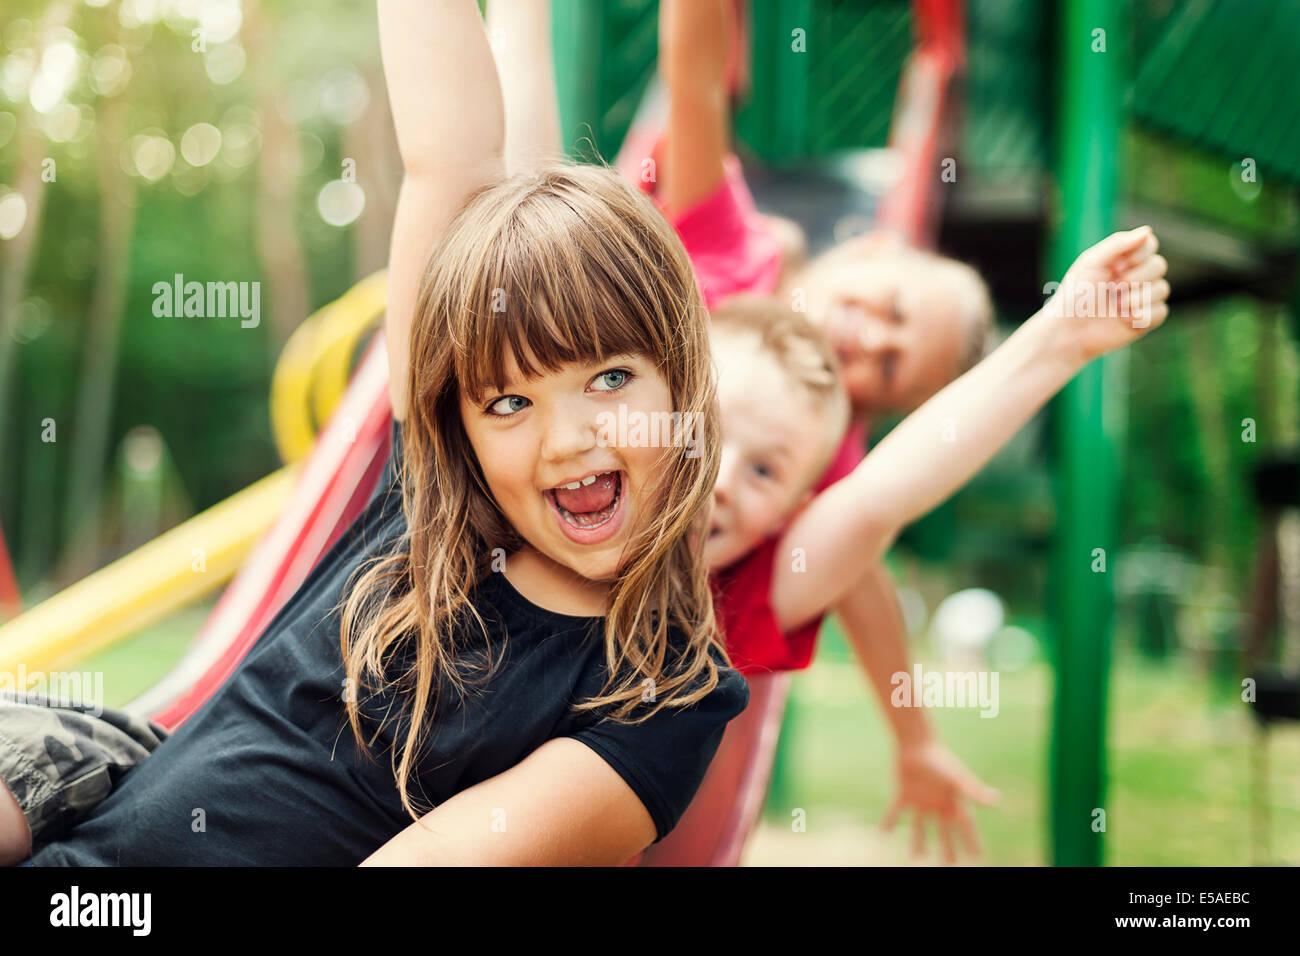 Kids having fun on slide, Debica, Poland - Stock Image